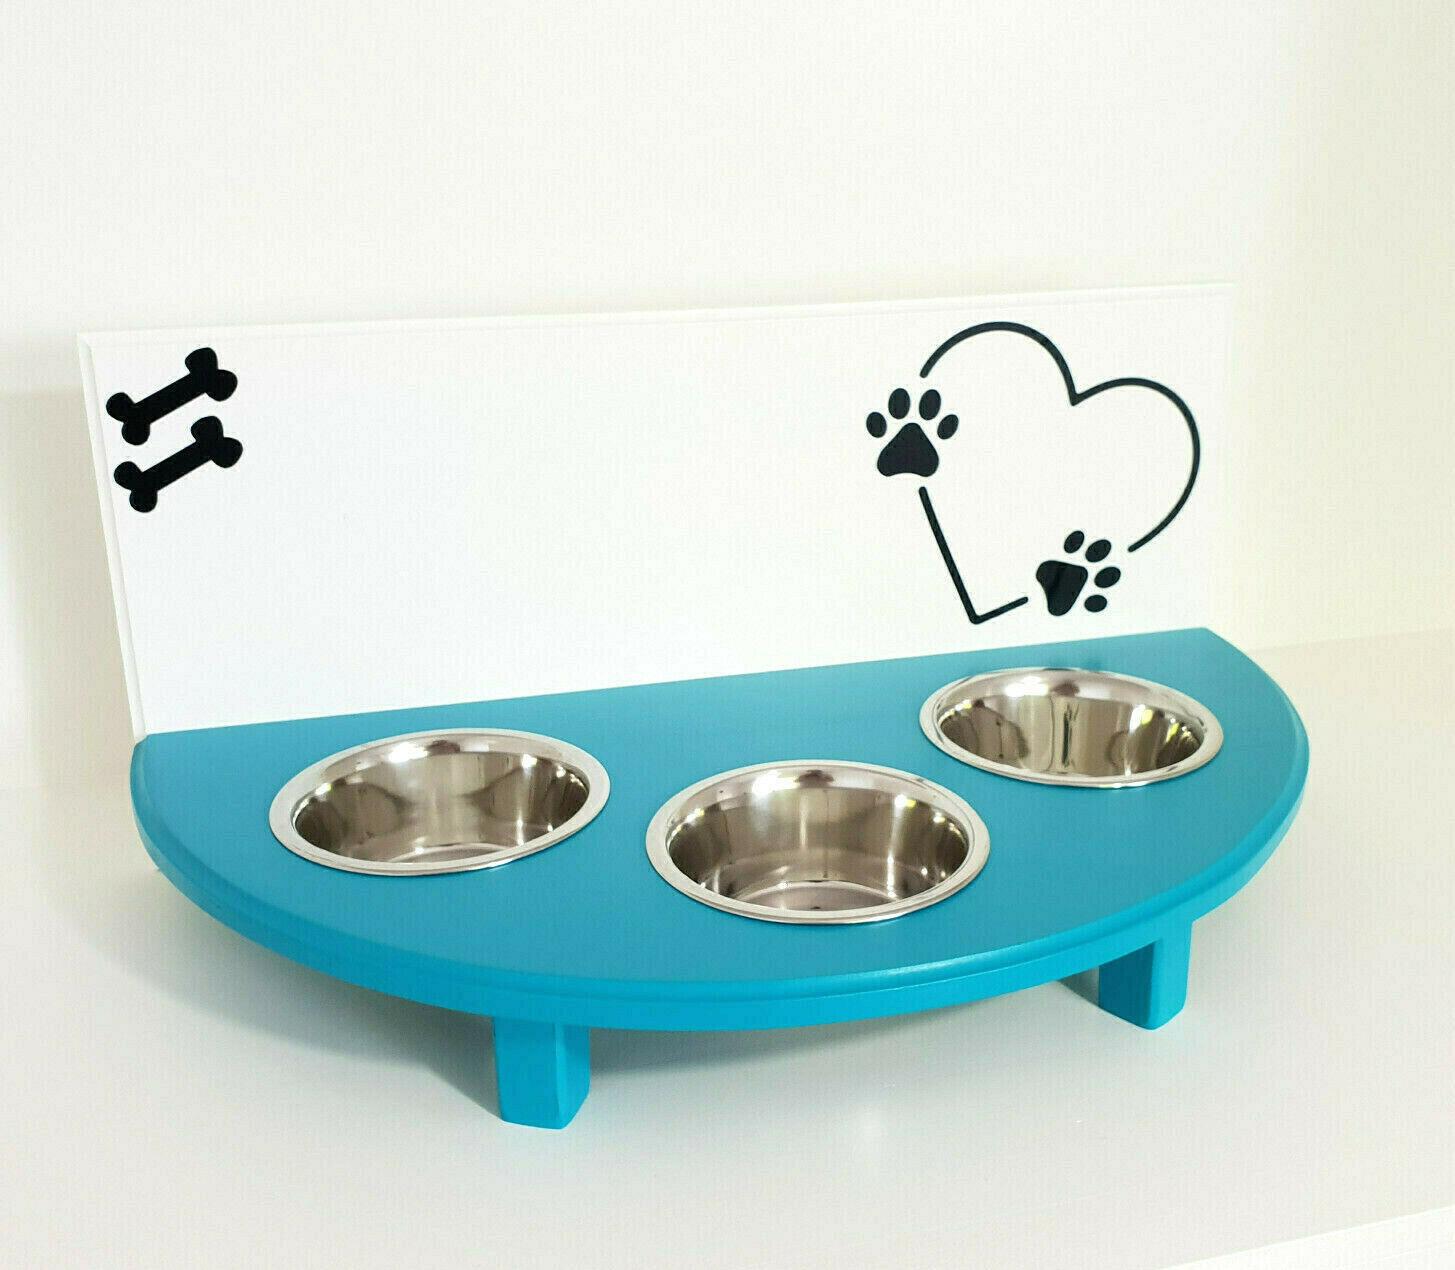 Hundenäpfe, Futterbar, Napfständer 3 Näpfe, weiß türkis. Wunschname  (81r)